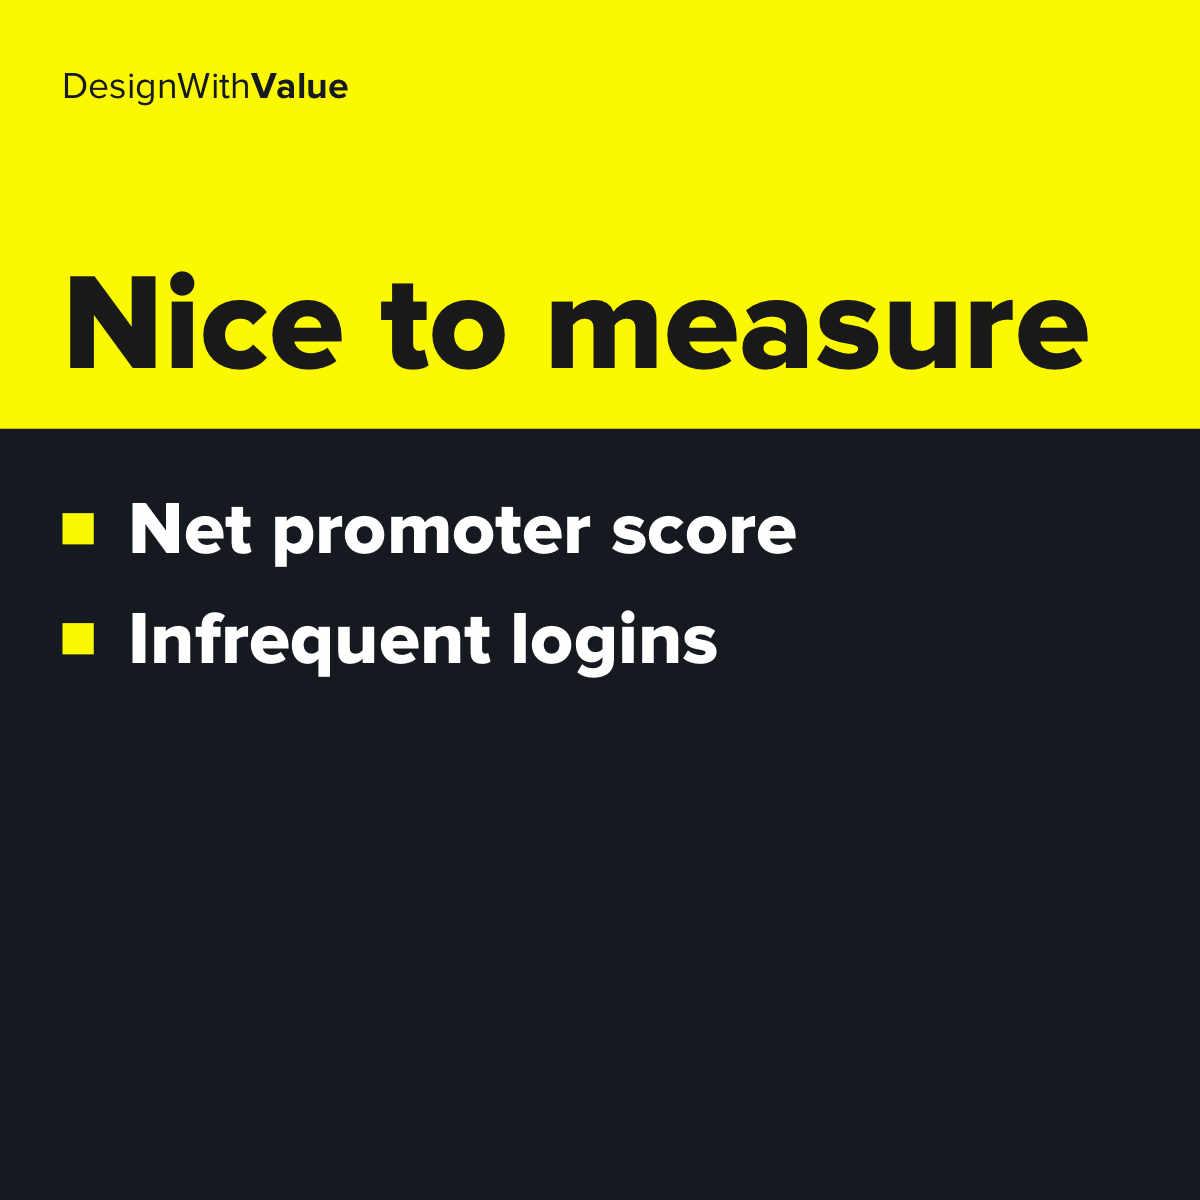 Nice to measure metrics: Net promoter score, infrequent logins